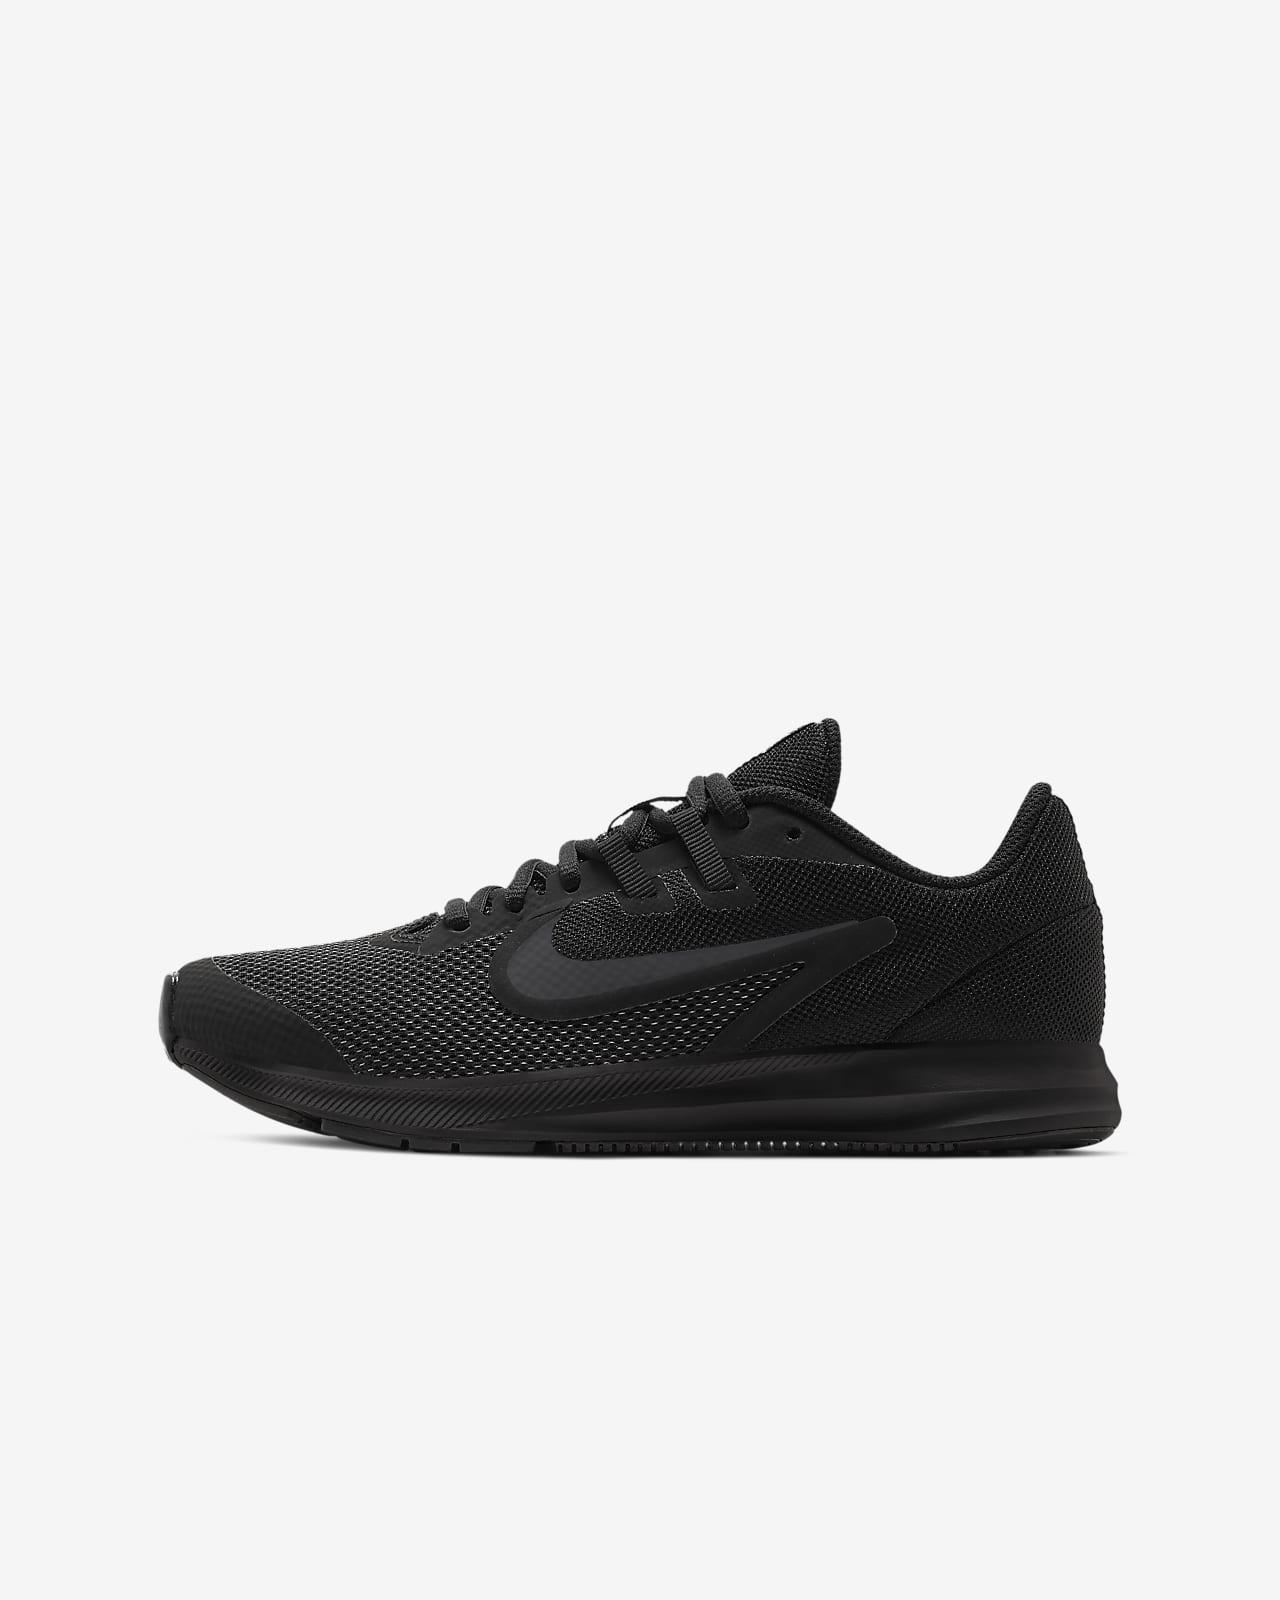 Nike Downshifter 9 Zapatillas de running - Niño/a